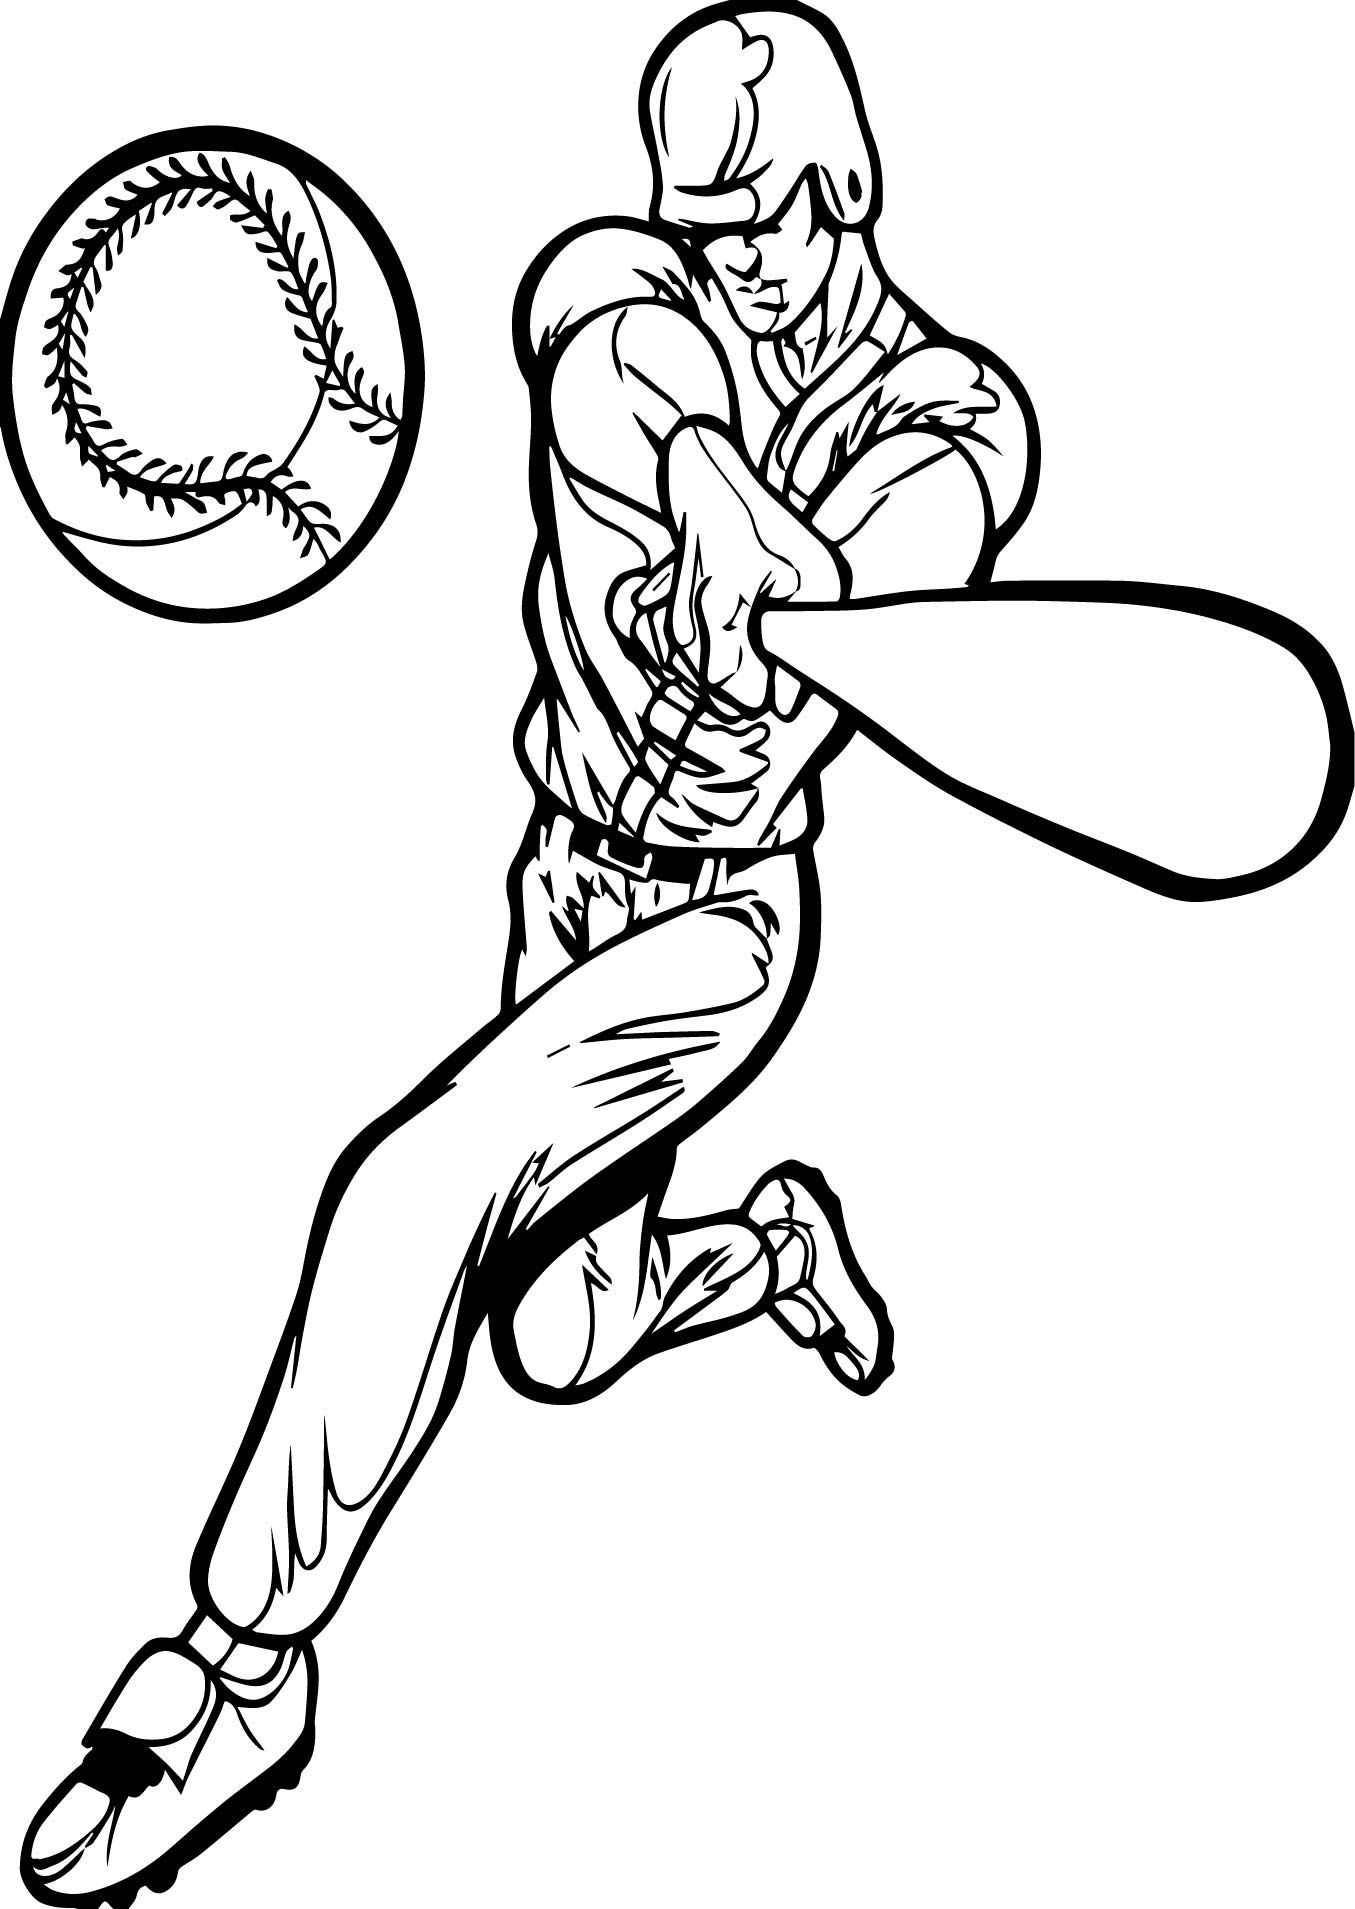 Nice Perfect Playing Baseball Man Coloring Page Baseball Coloring Pages Sports Coloring Pages Football Coloring Pages